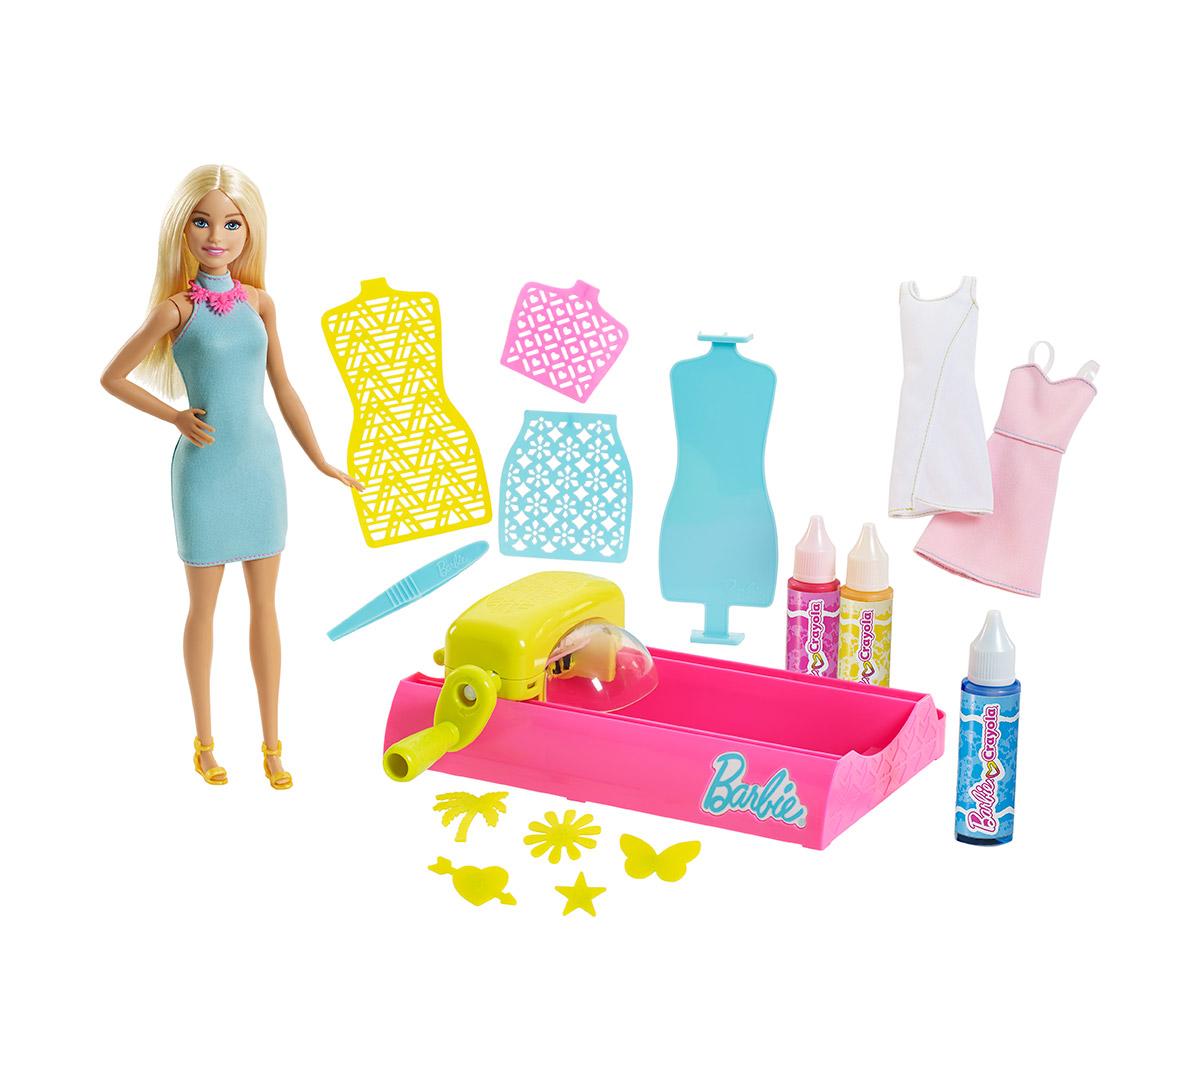 Barbie Crayola Color Magic Station Doll Washable Paint Set